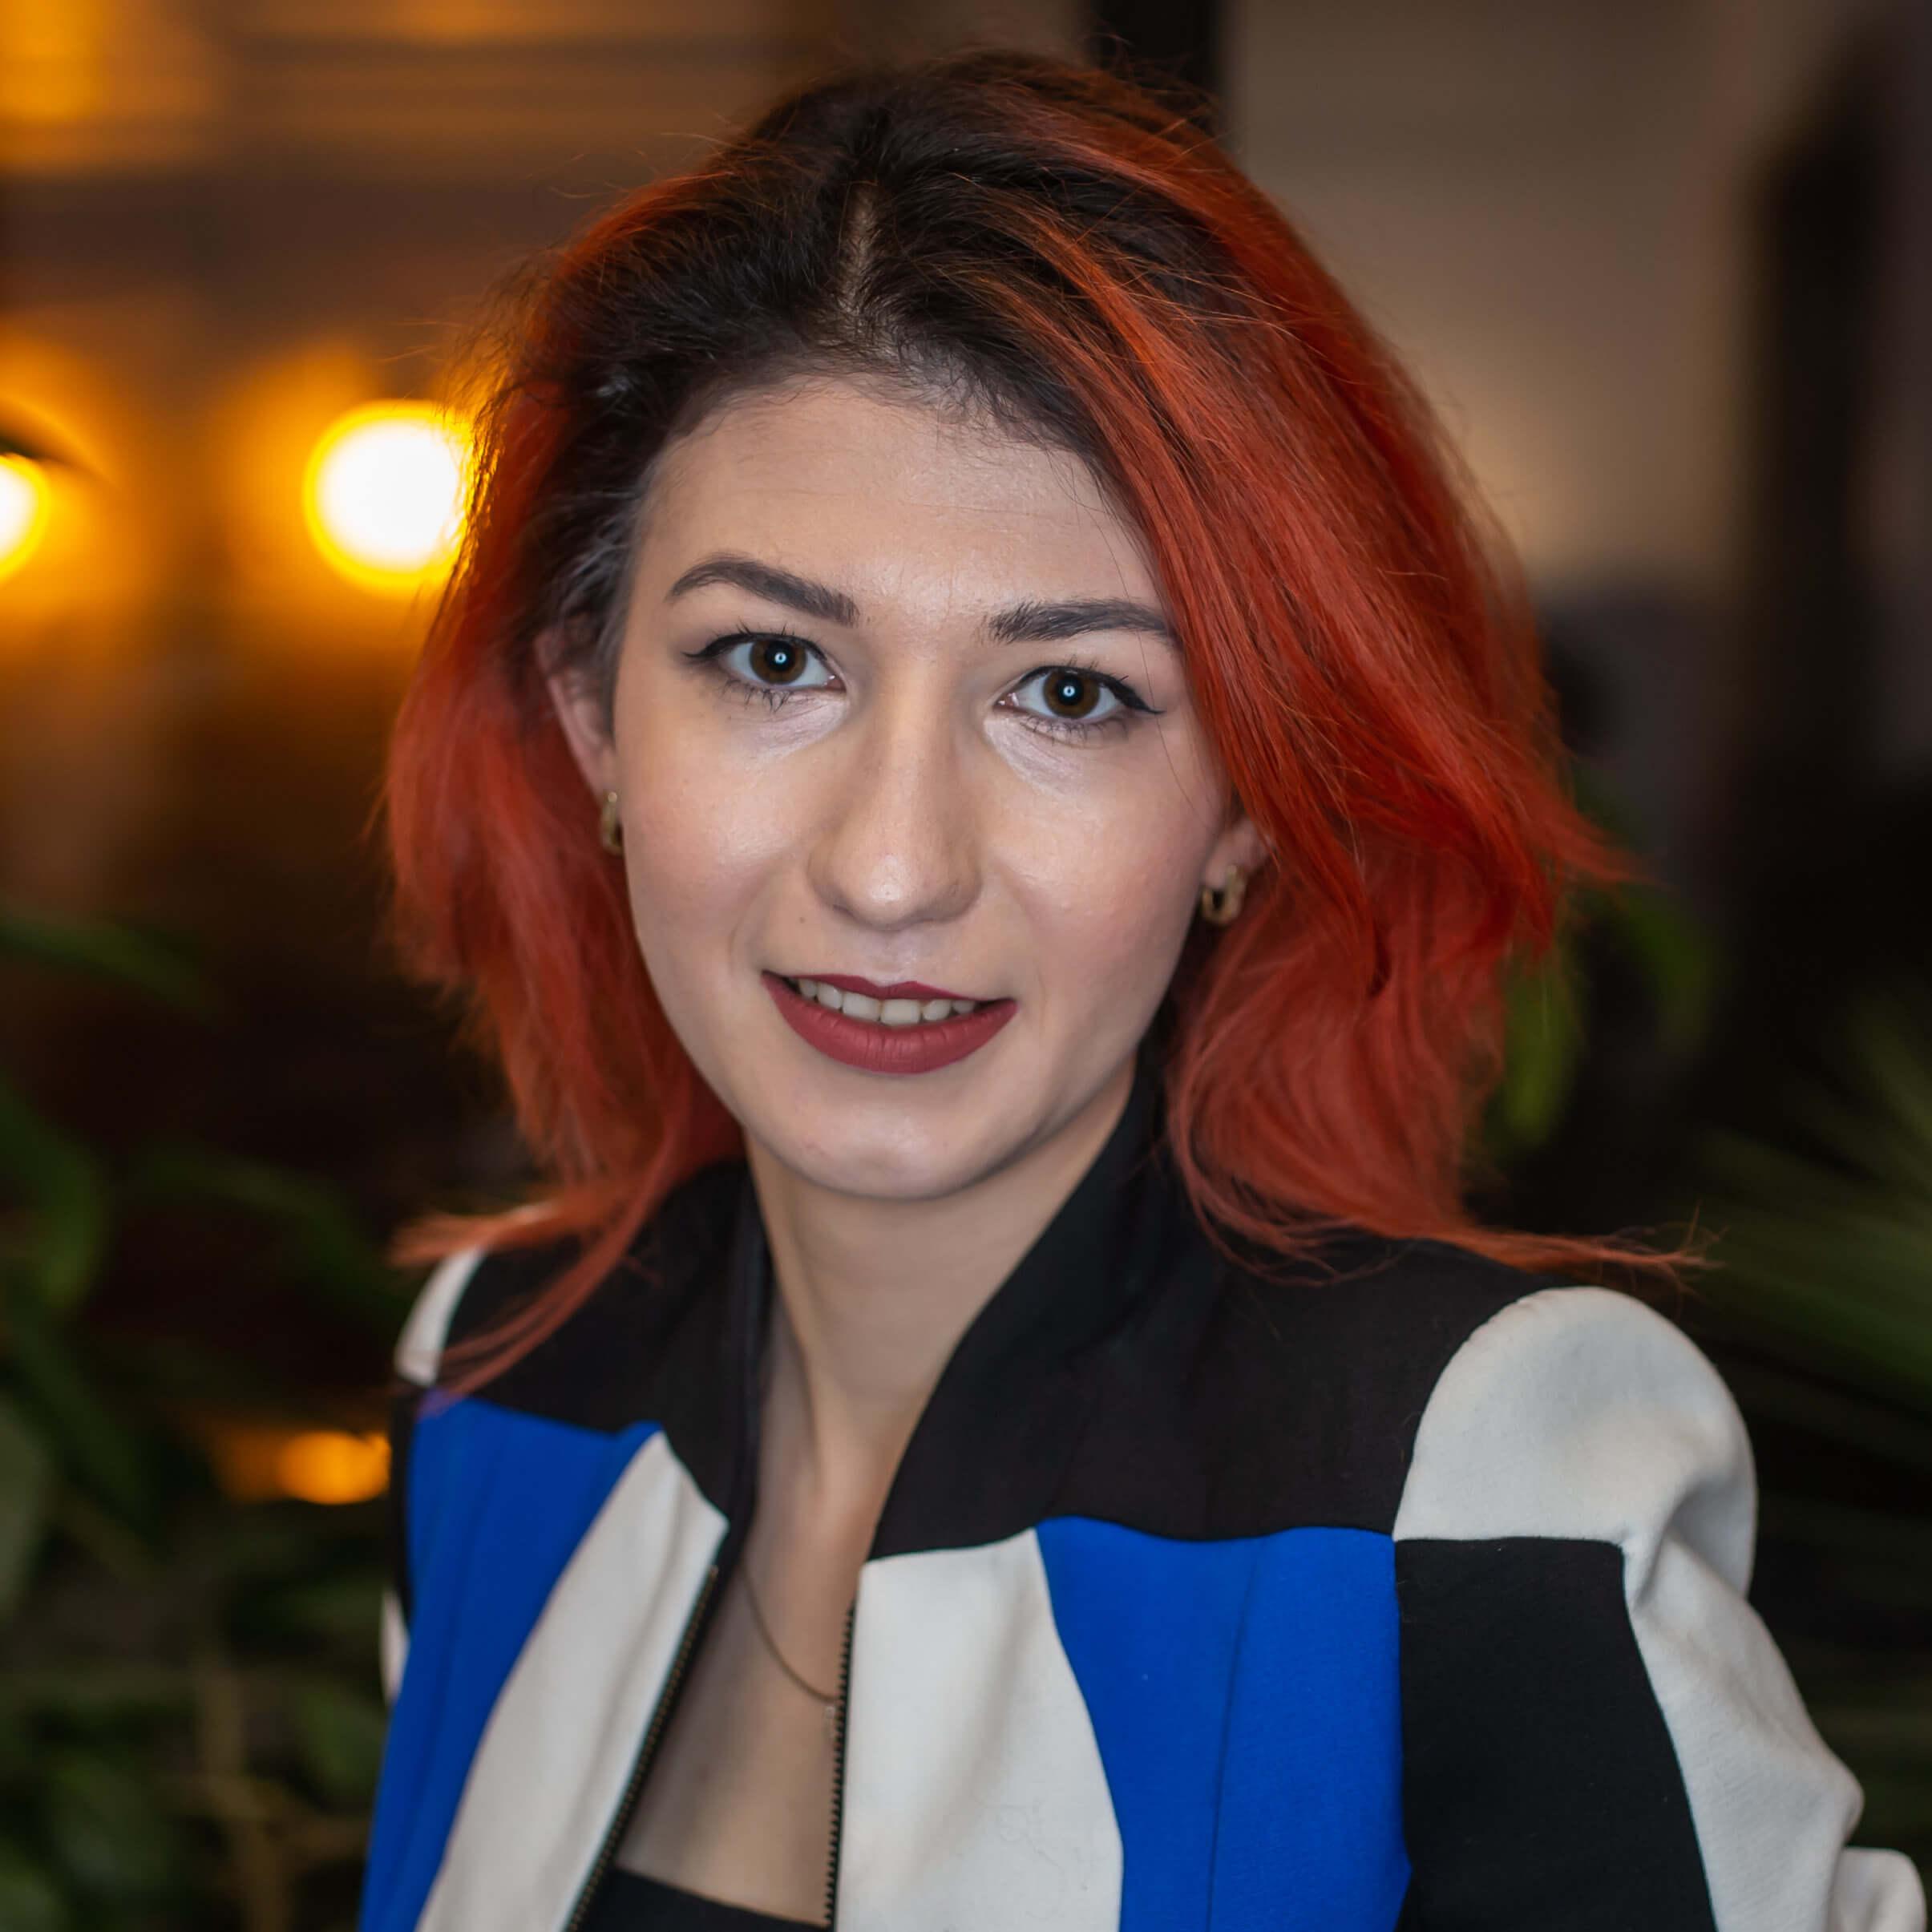 Ioana Vasilev